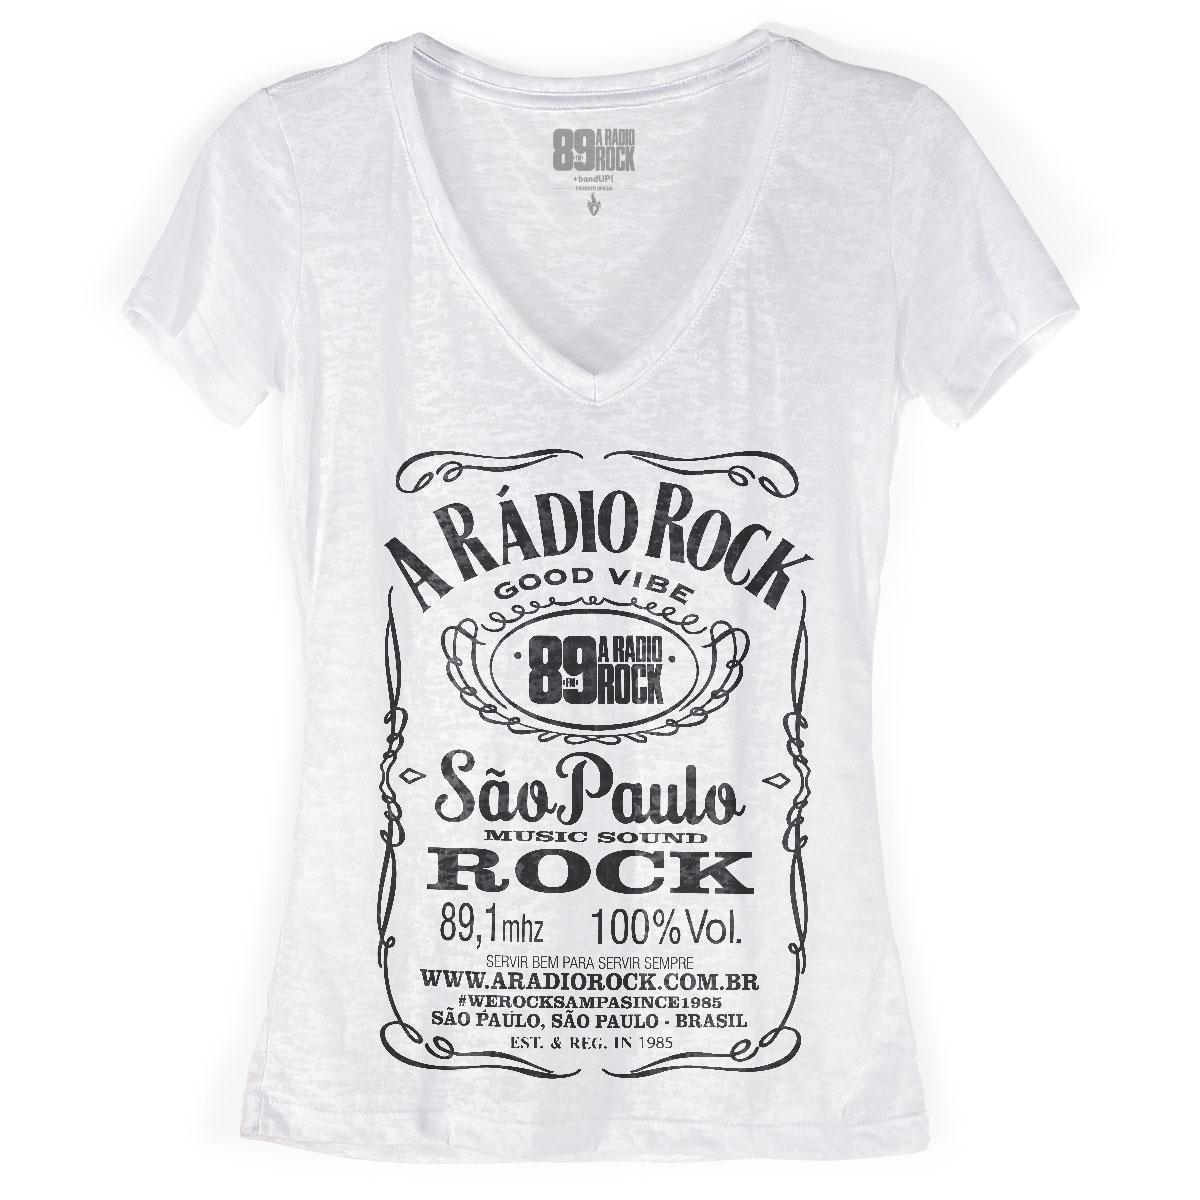 Camiseta Devorê Feminina 89FM A Rádio Rock